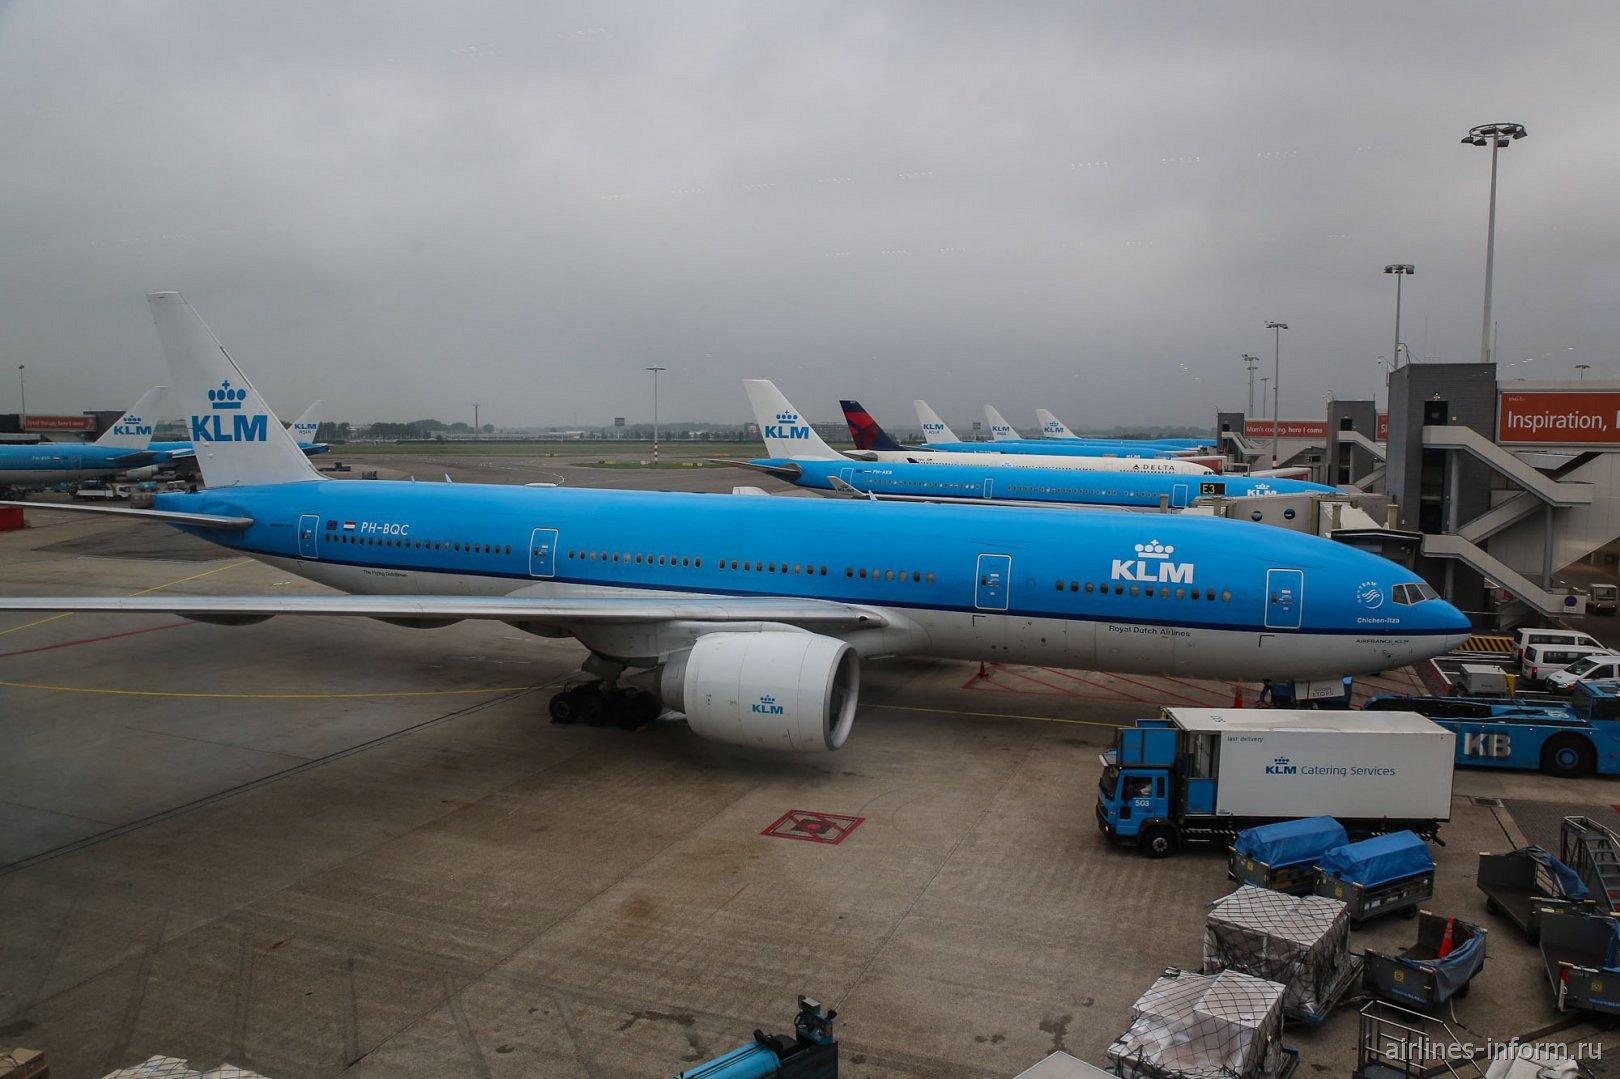 Самолеты авиакомпании KLM в аэропорту Амстердам Схипхол